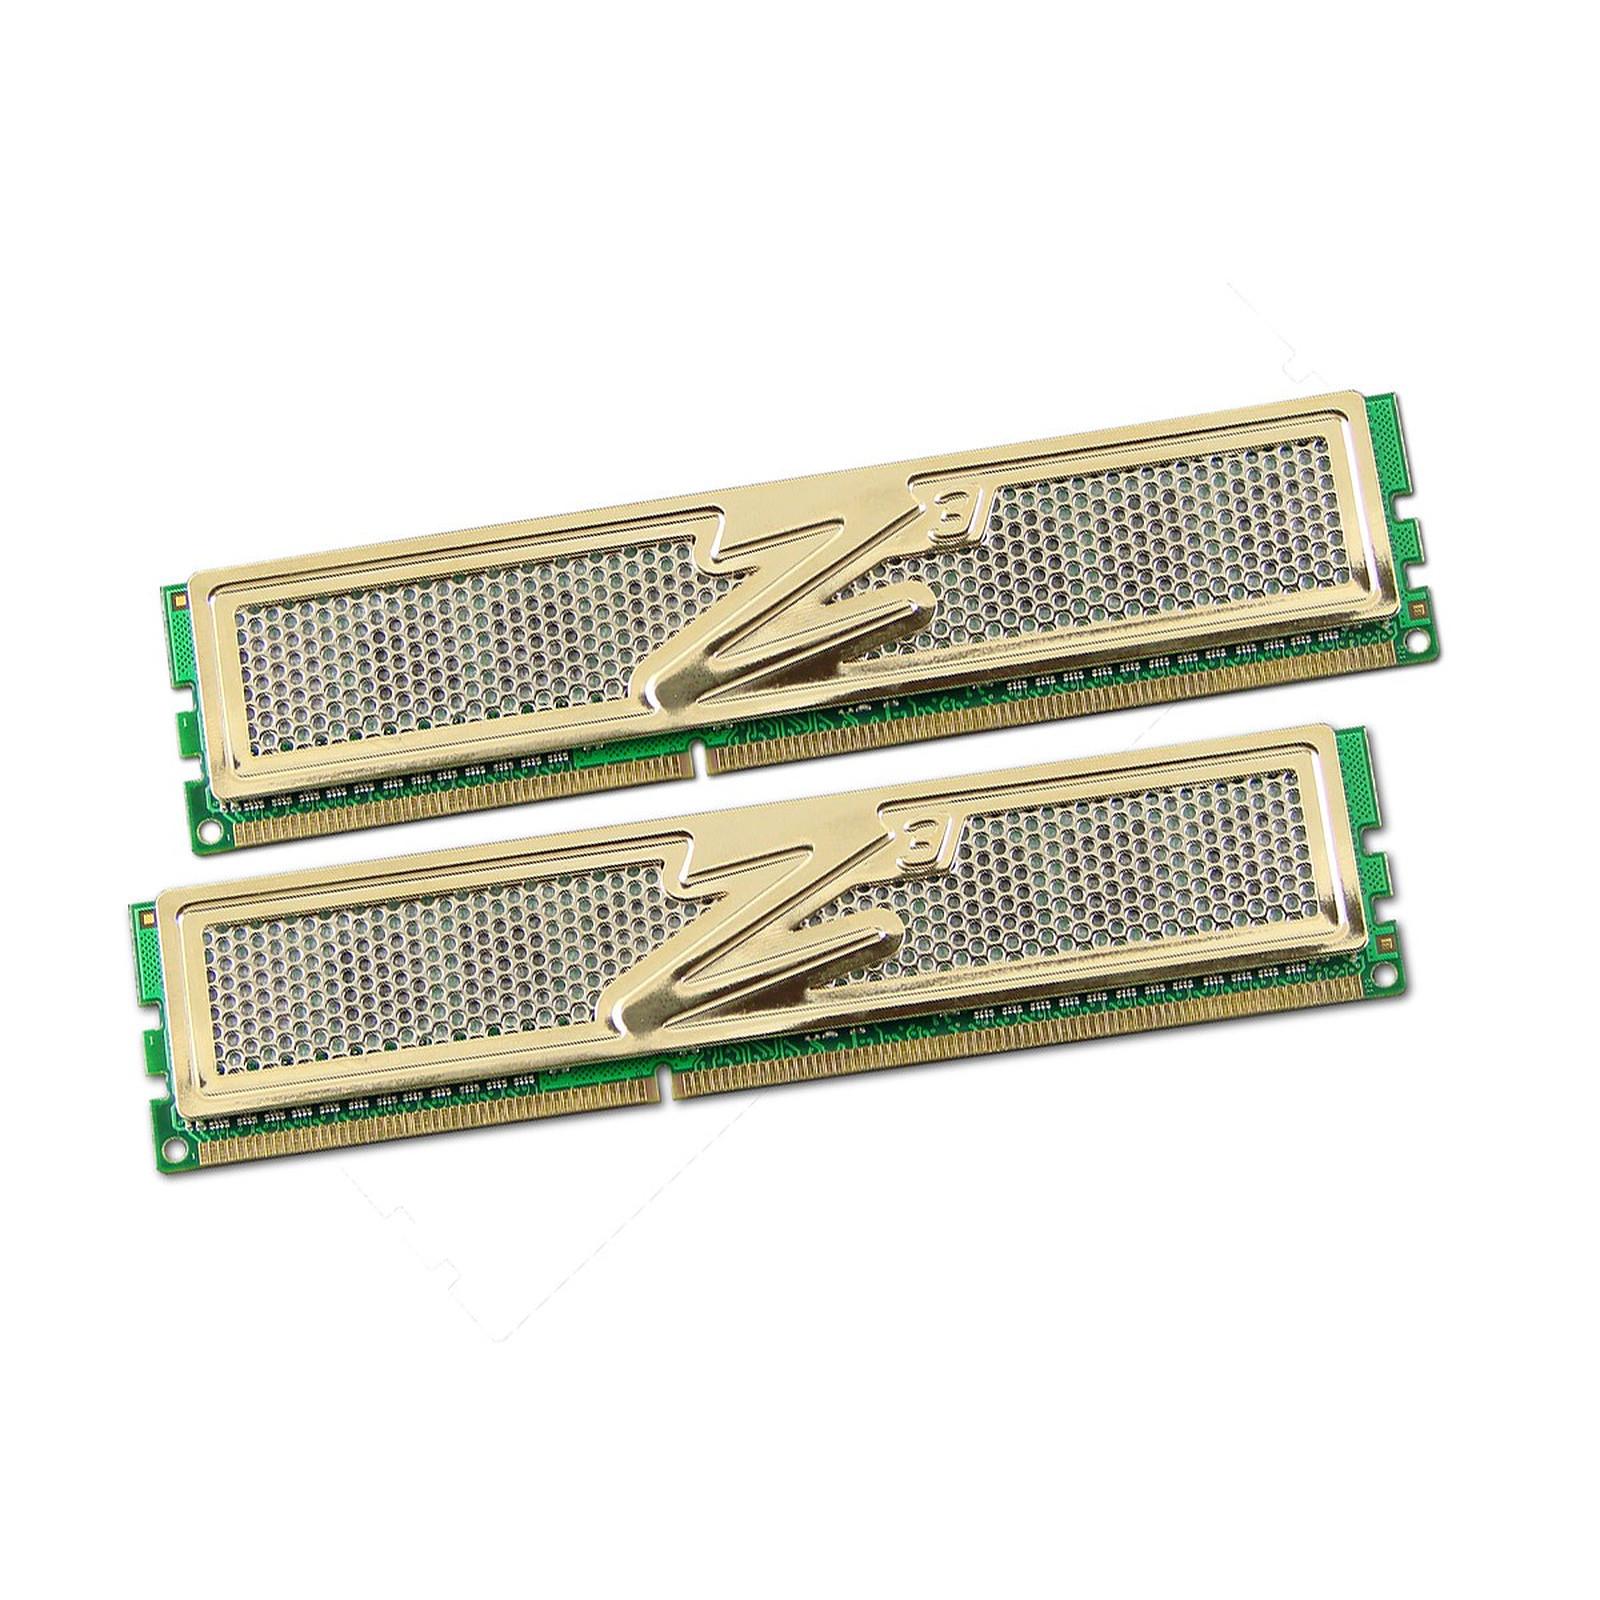 OCZ Gold Edition 8 Go (2x 4Go) DDR3 1333 MHz